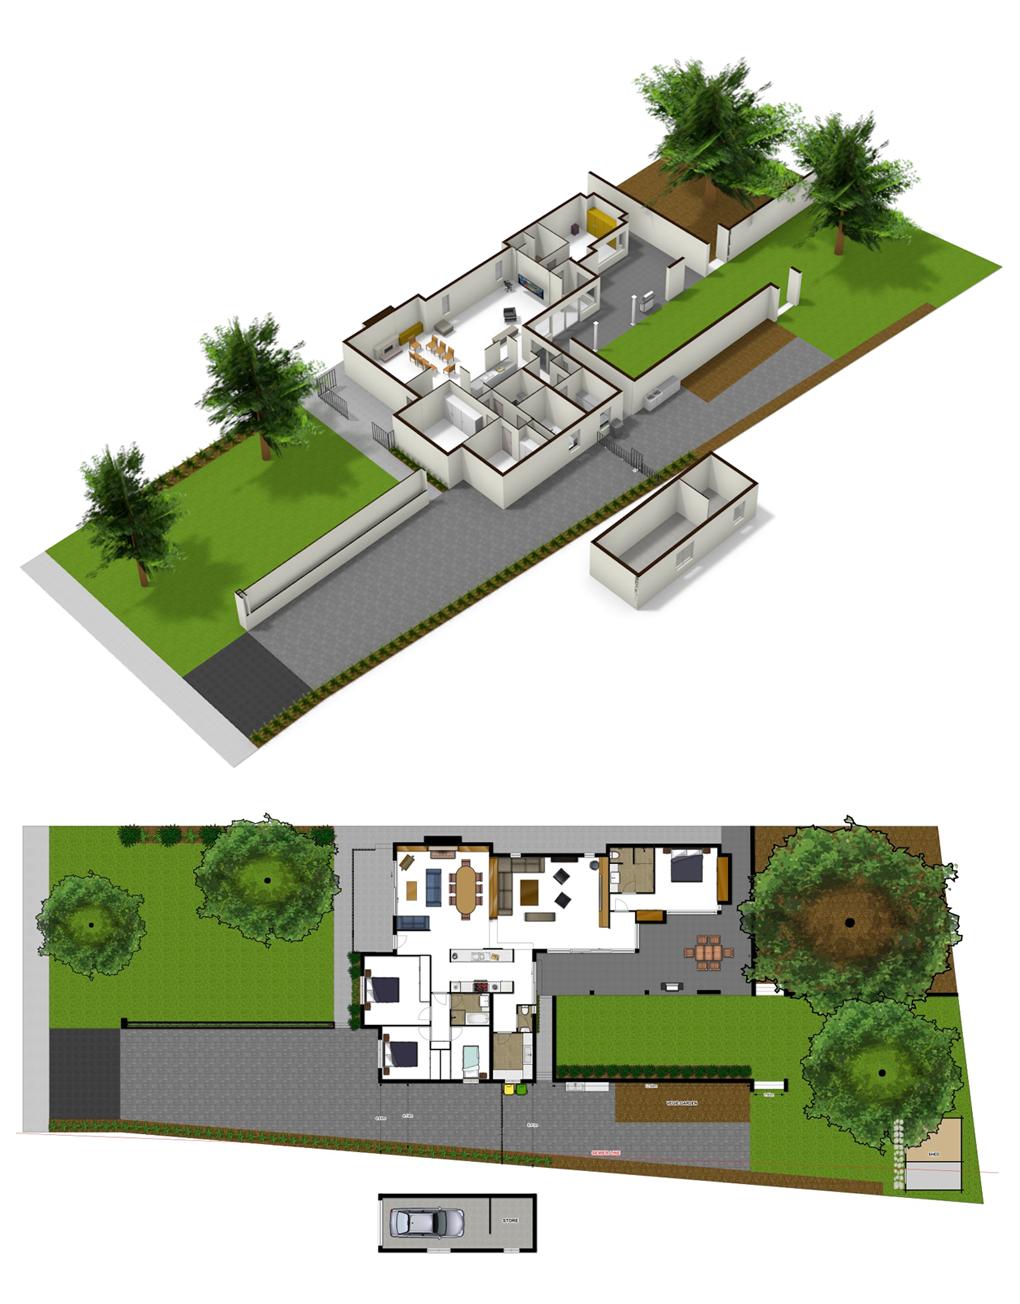 Home and garden design made in floorplanner | Cool floorplans ...